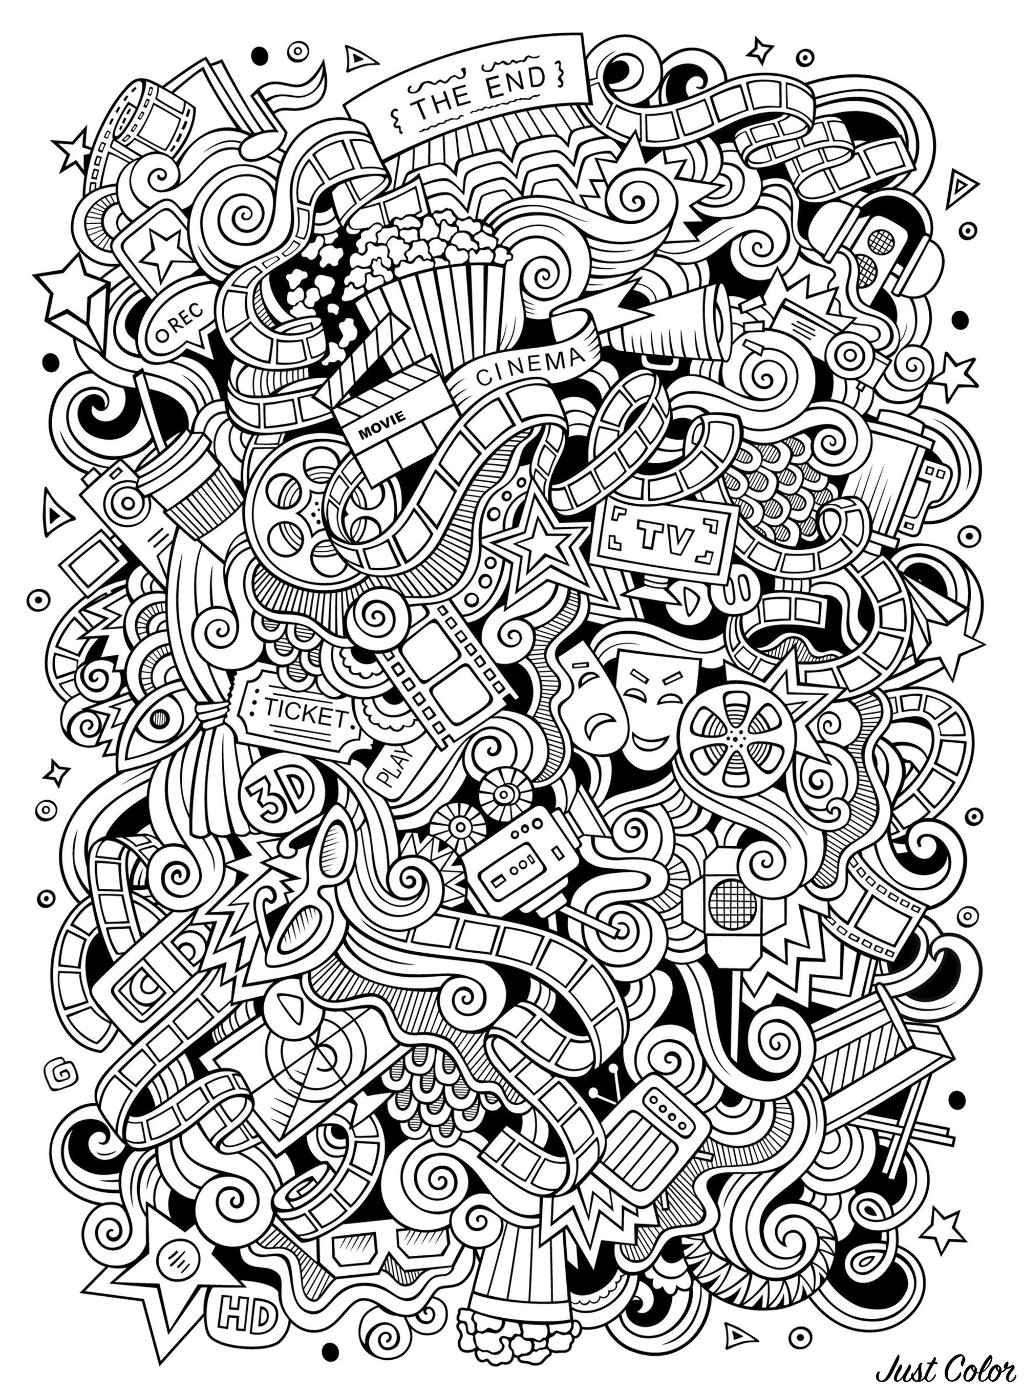 Malbuch Fur Erwachsene : Doodle art / Doodling - 1